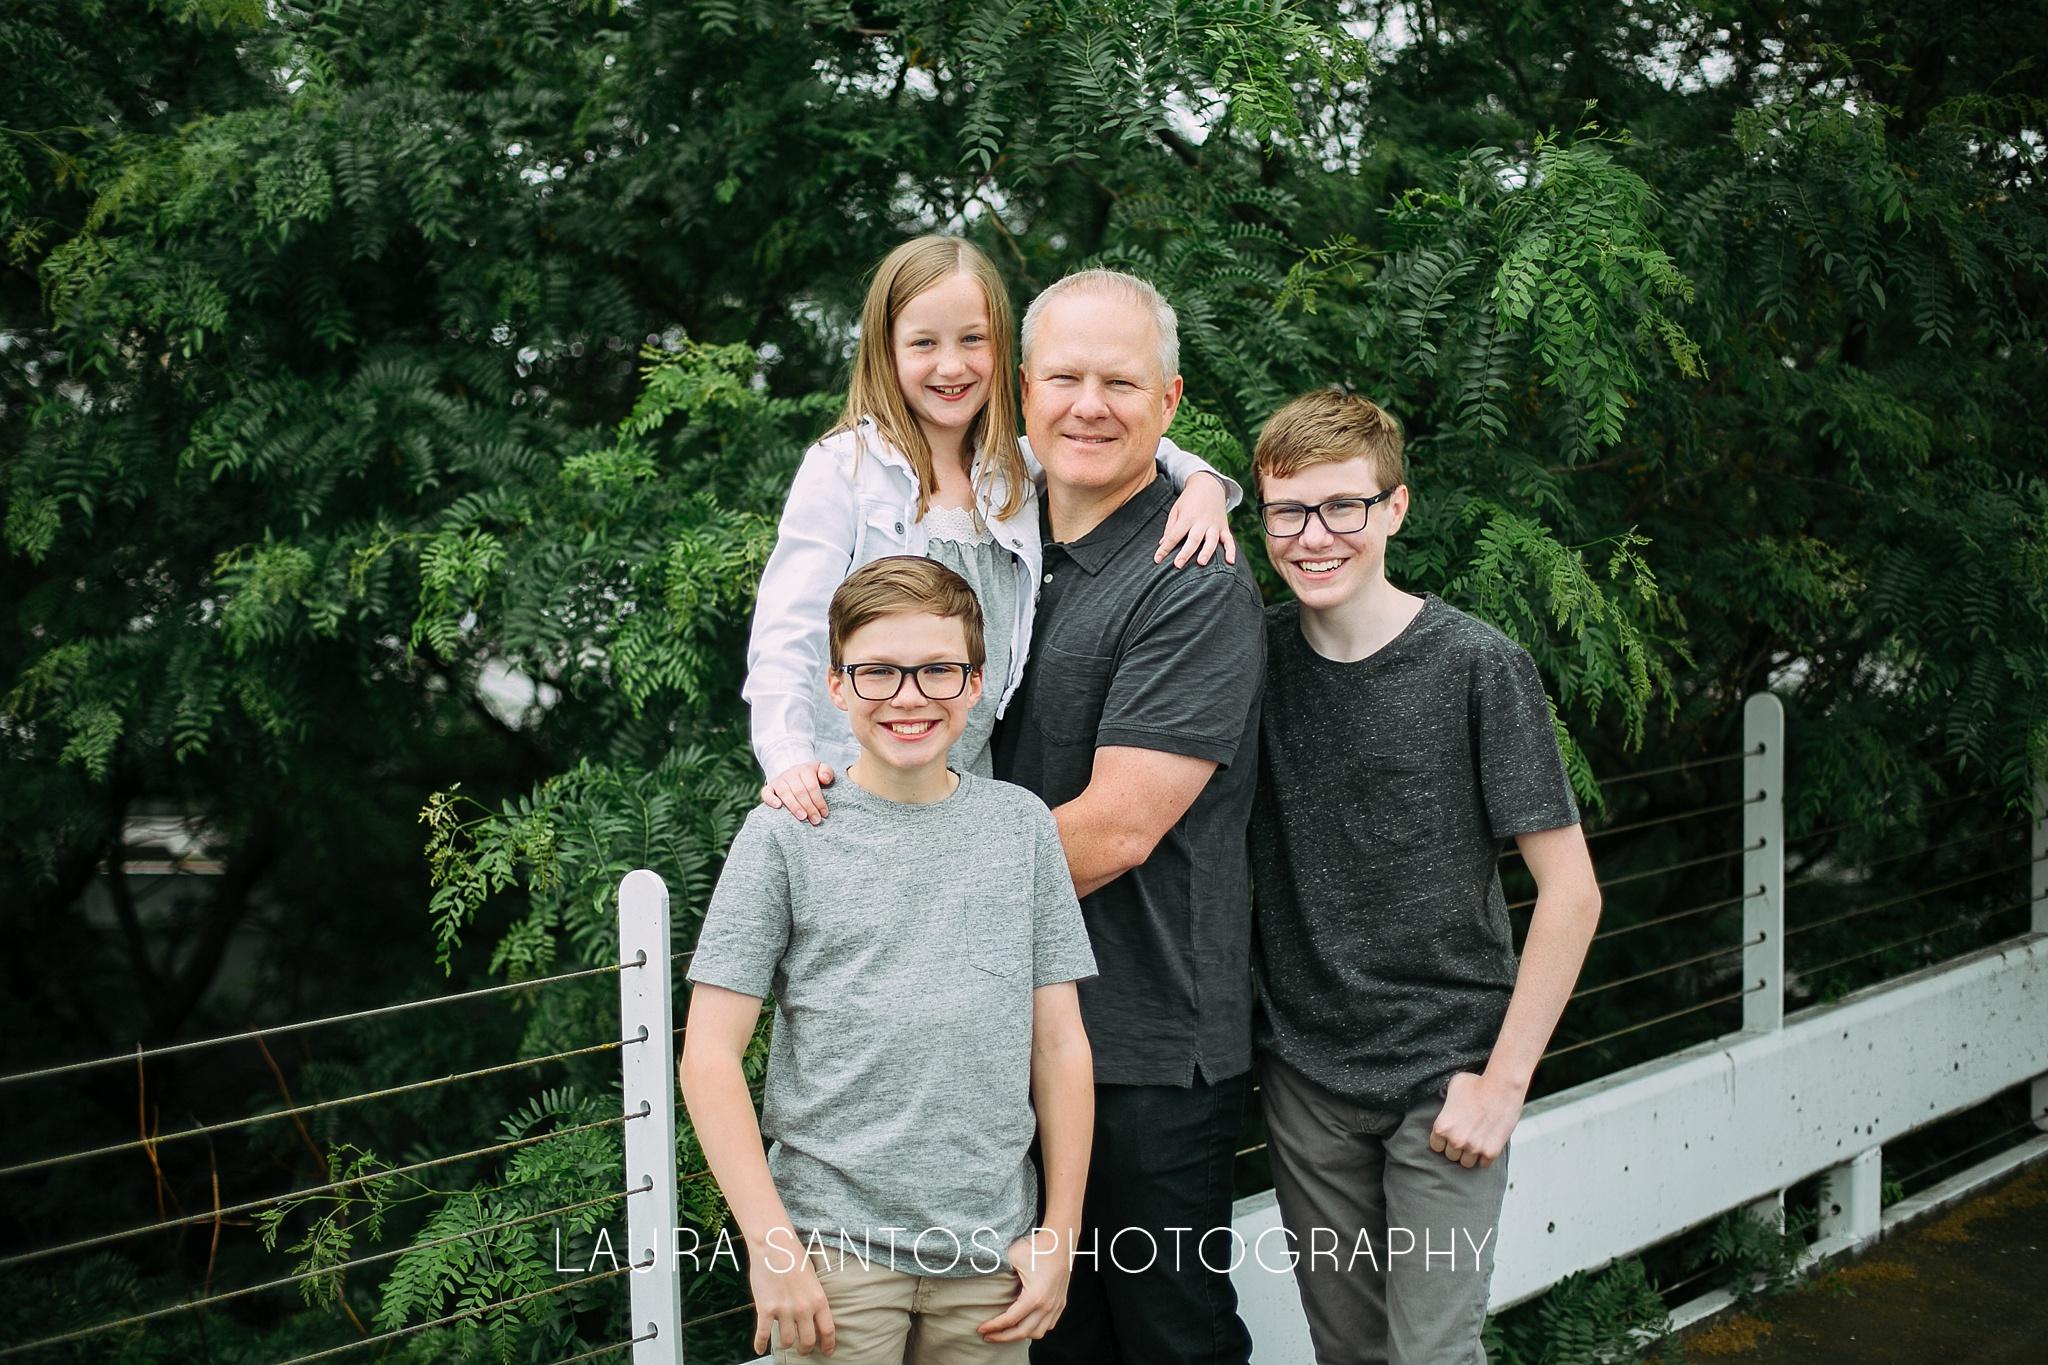 Laura Santos Photography Portland Oregon Family Photographer_0447.jpg